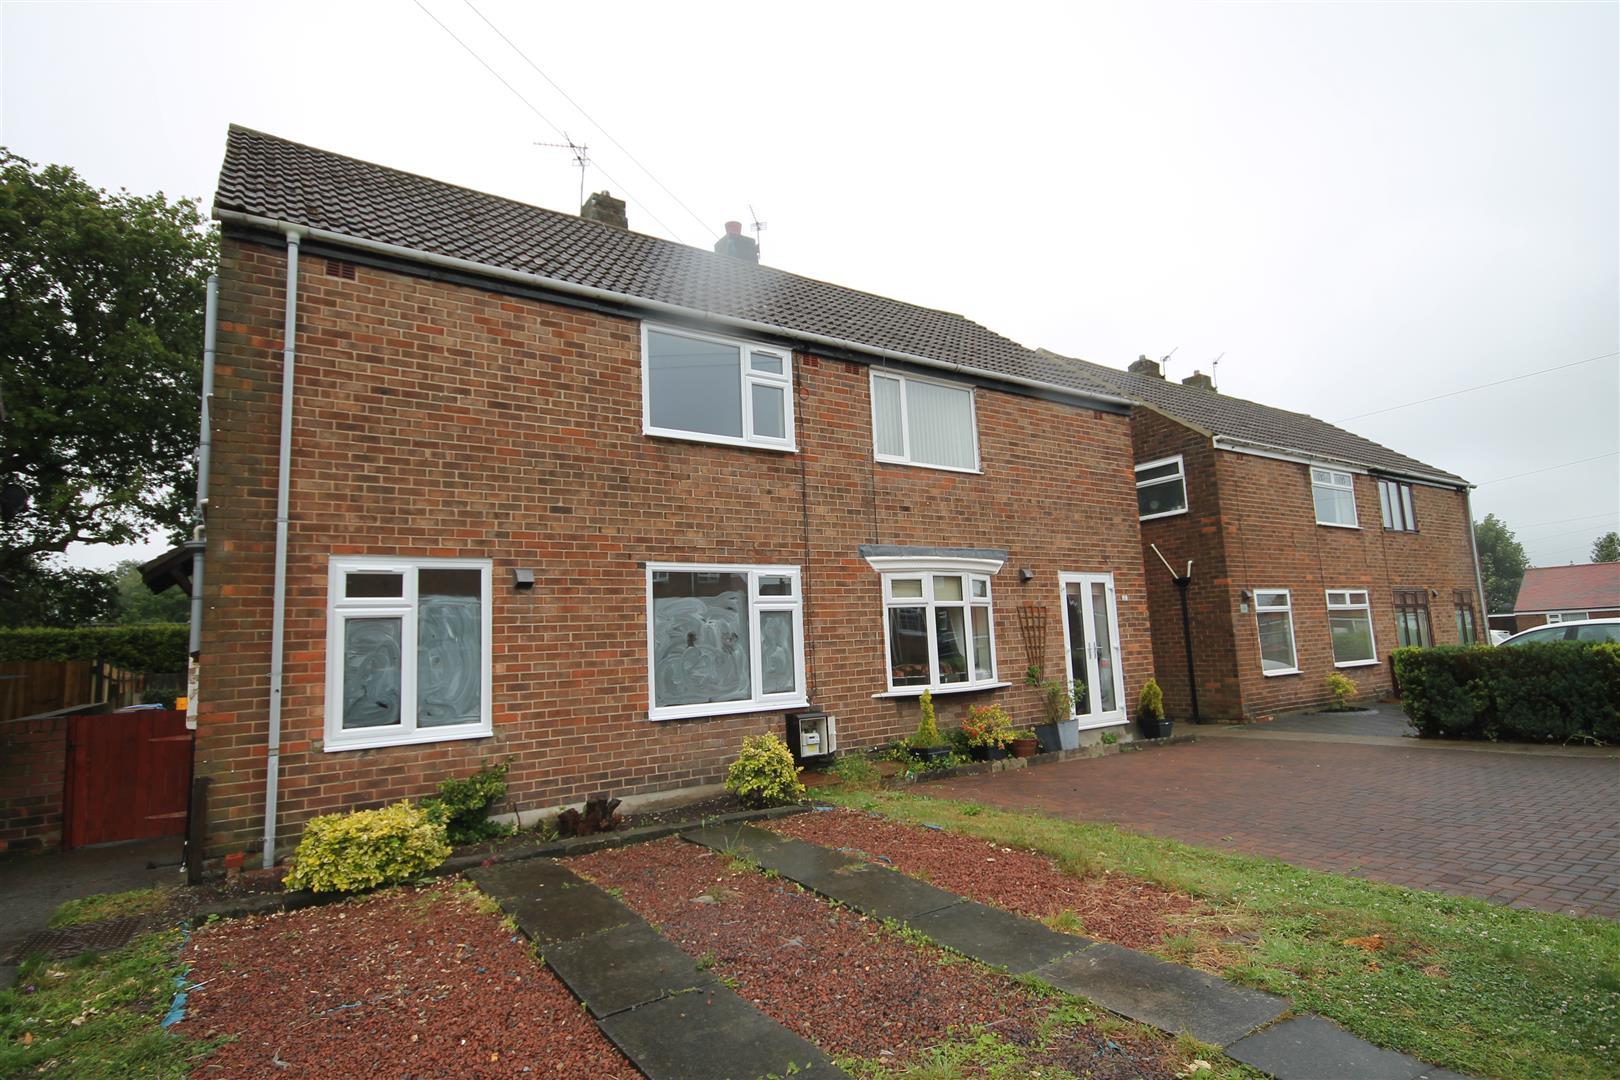 2 Bedrooms Semi Detached House for sale in Quarry Crescent, Bearpark, Durham